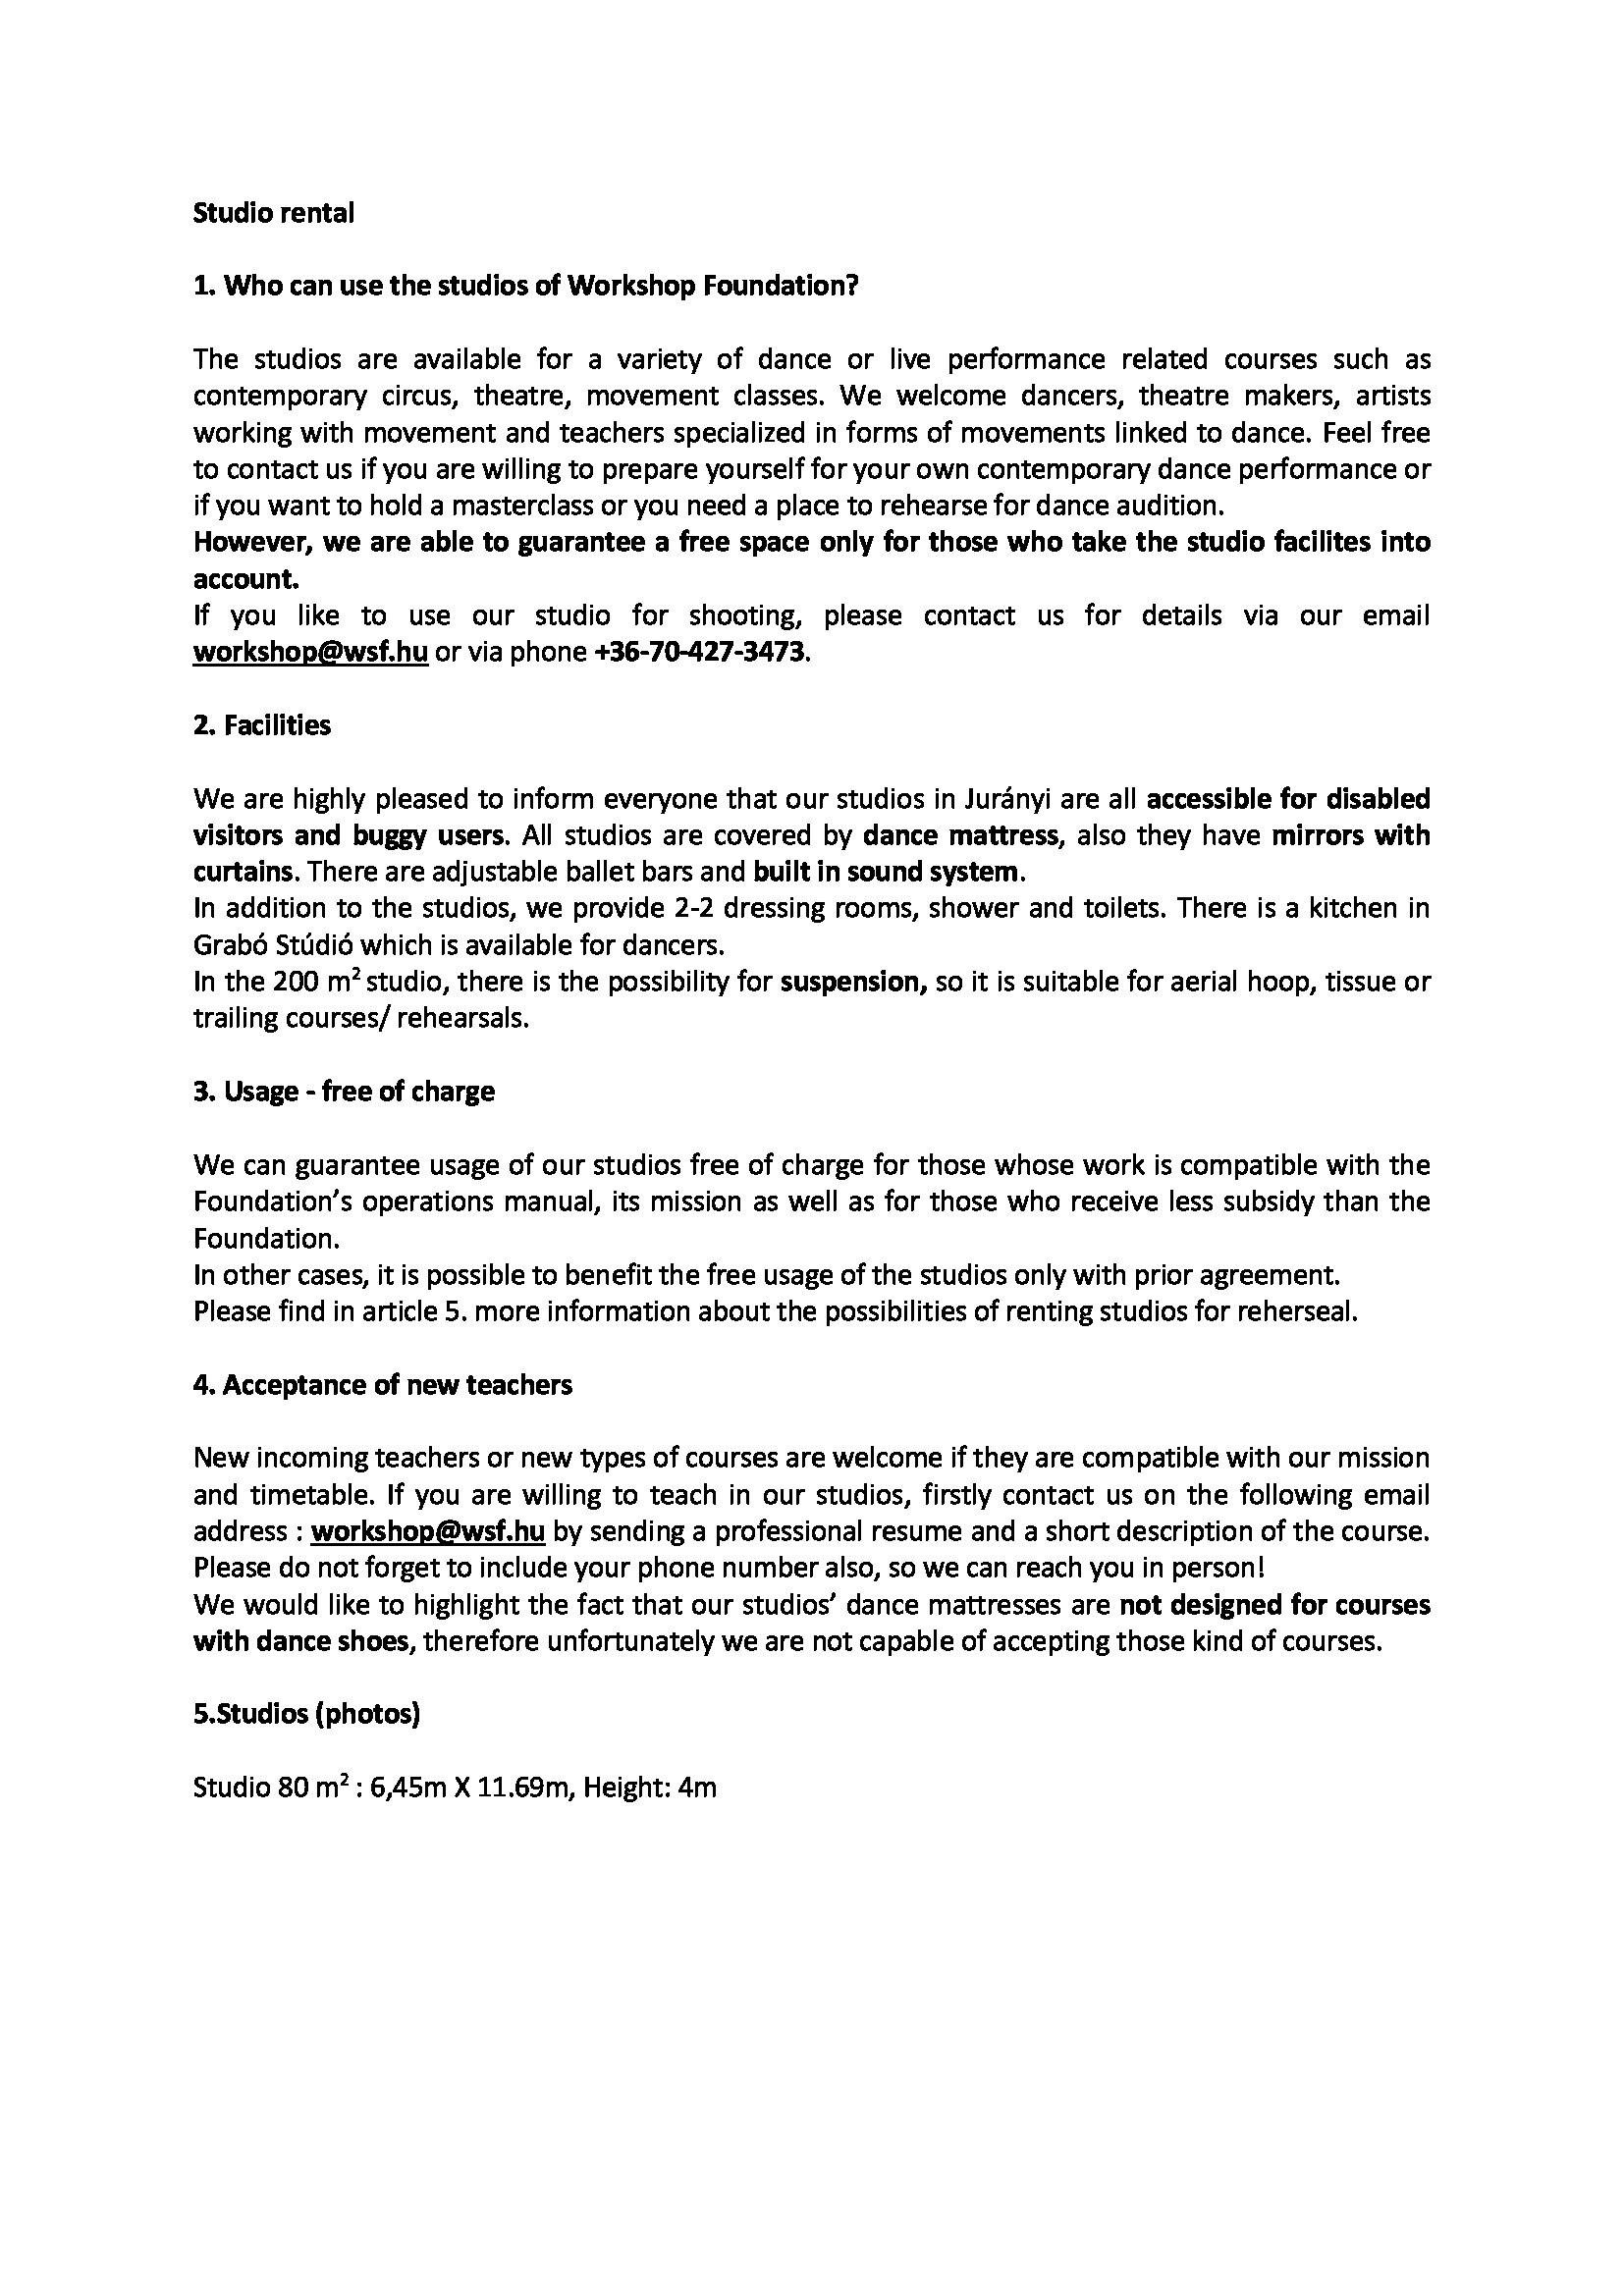 Workshop Foundation  Contemporary Dance  Home  Studio Rental Regarding Dance Studio Rental Agreement Template